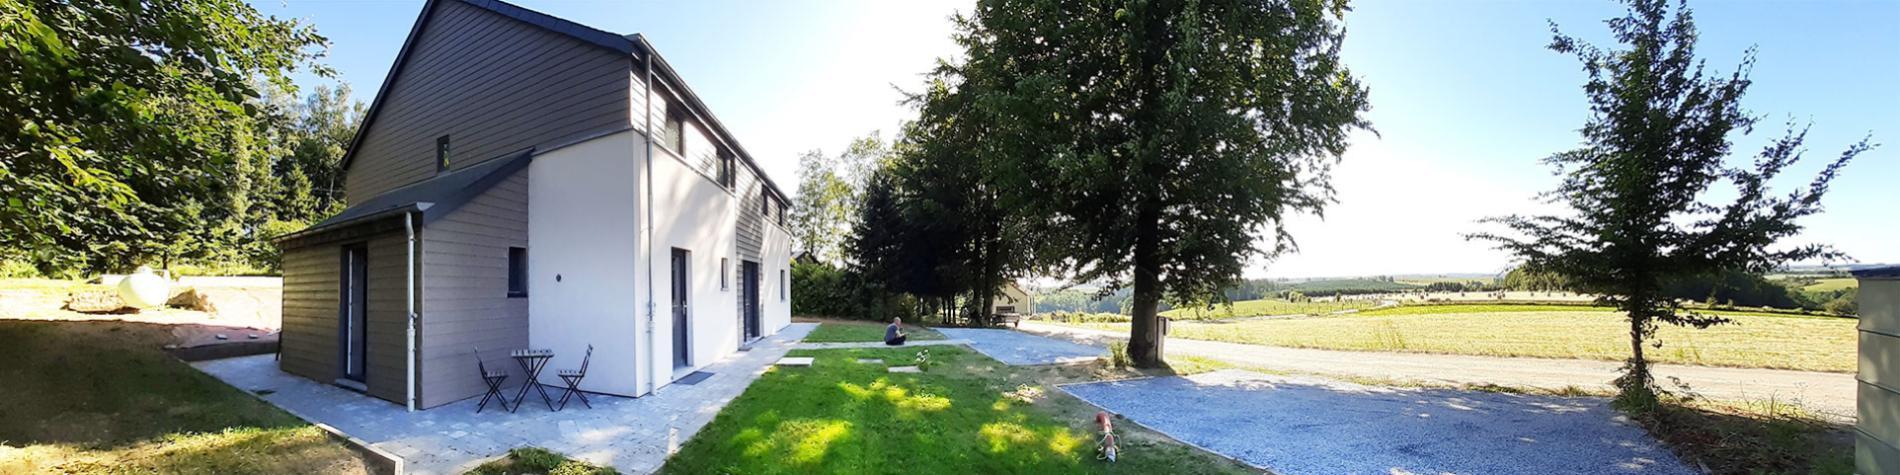 Gîte rural - Ardenne Céleste - Grapfontaine